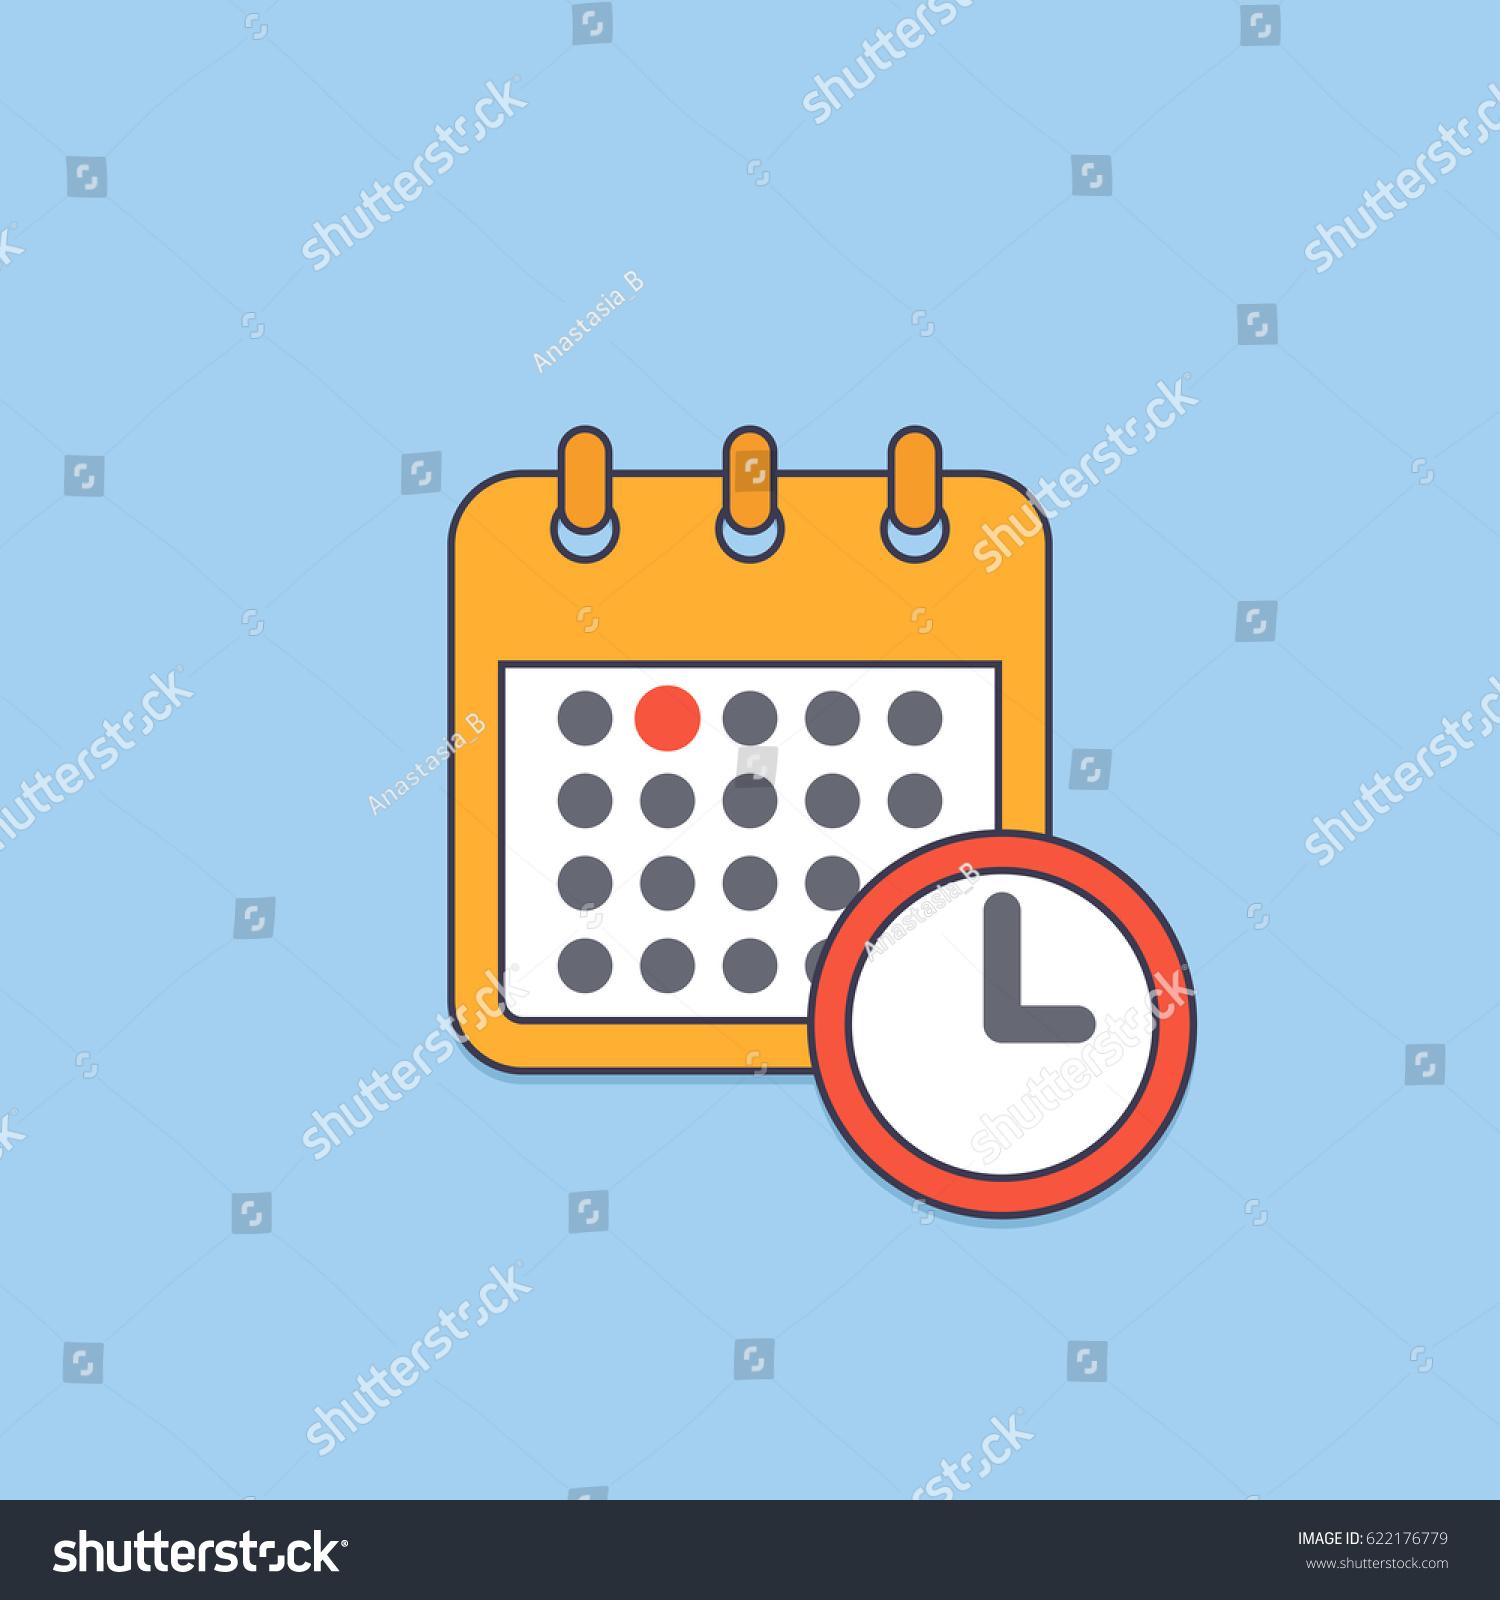 Calendar Timer App Trackingtime Real Time Collaboration And Organization Vector Calendar Deadline Reminder Symbol Meeting Stock